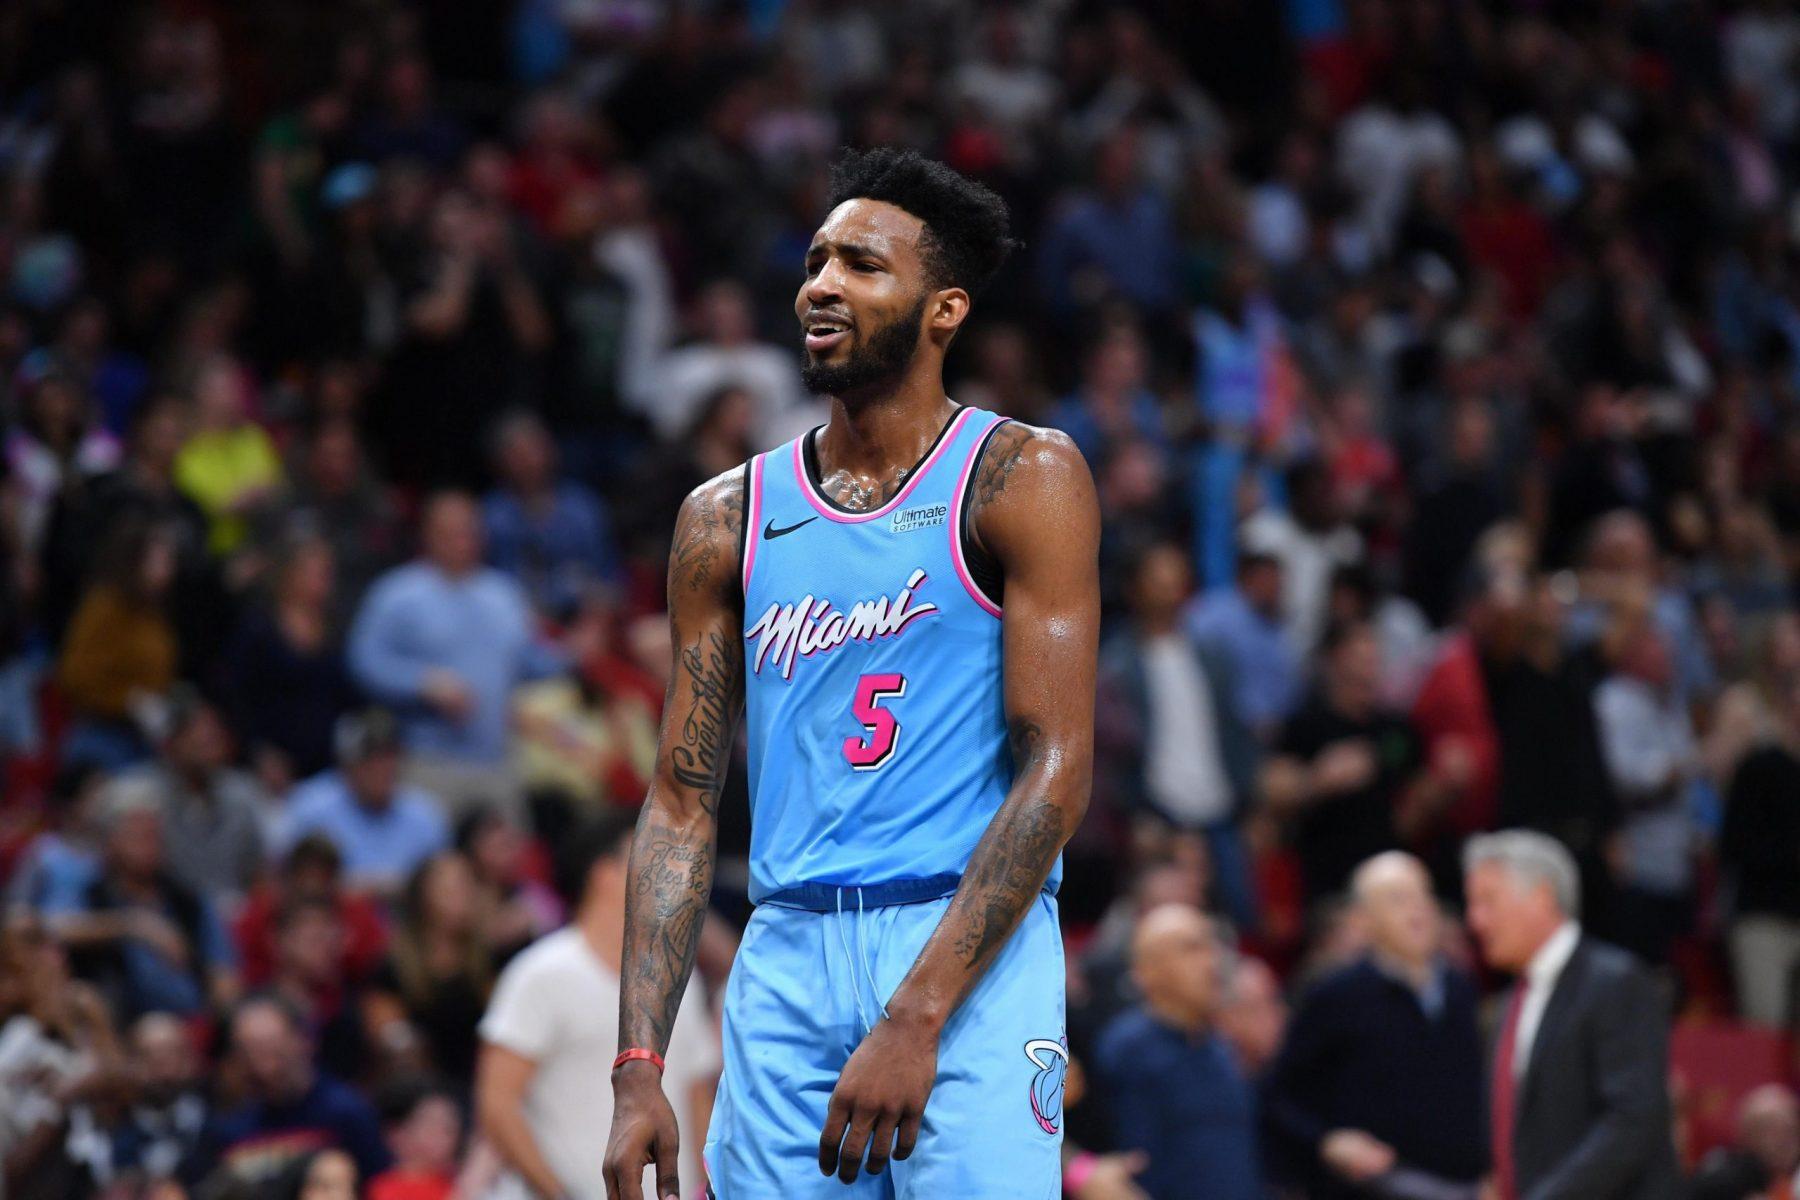 Heat's Derrick Jones Jr. tests positive for COVID-19